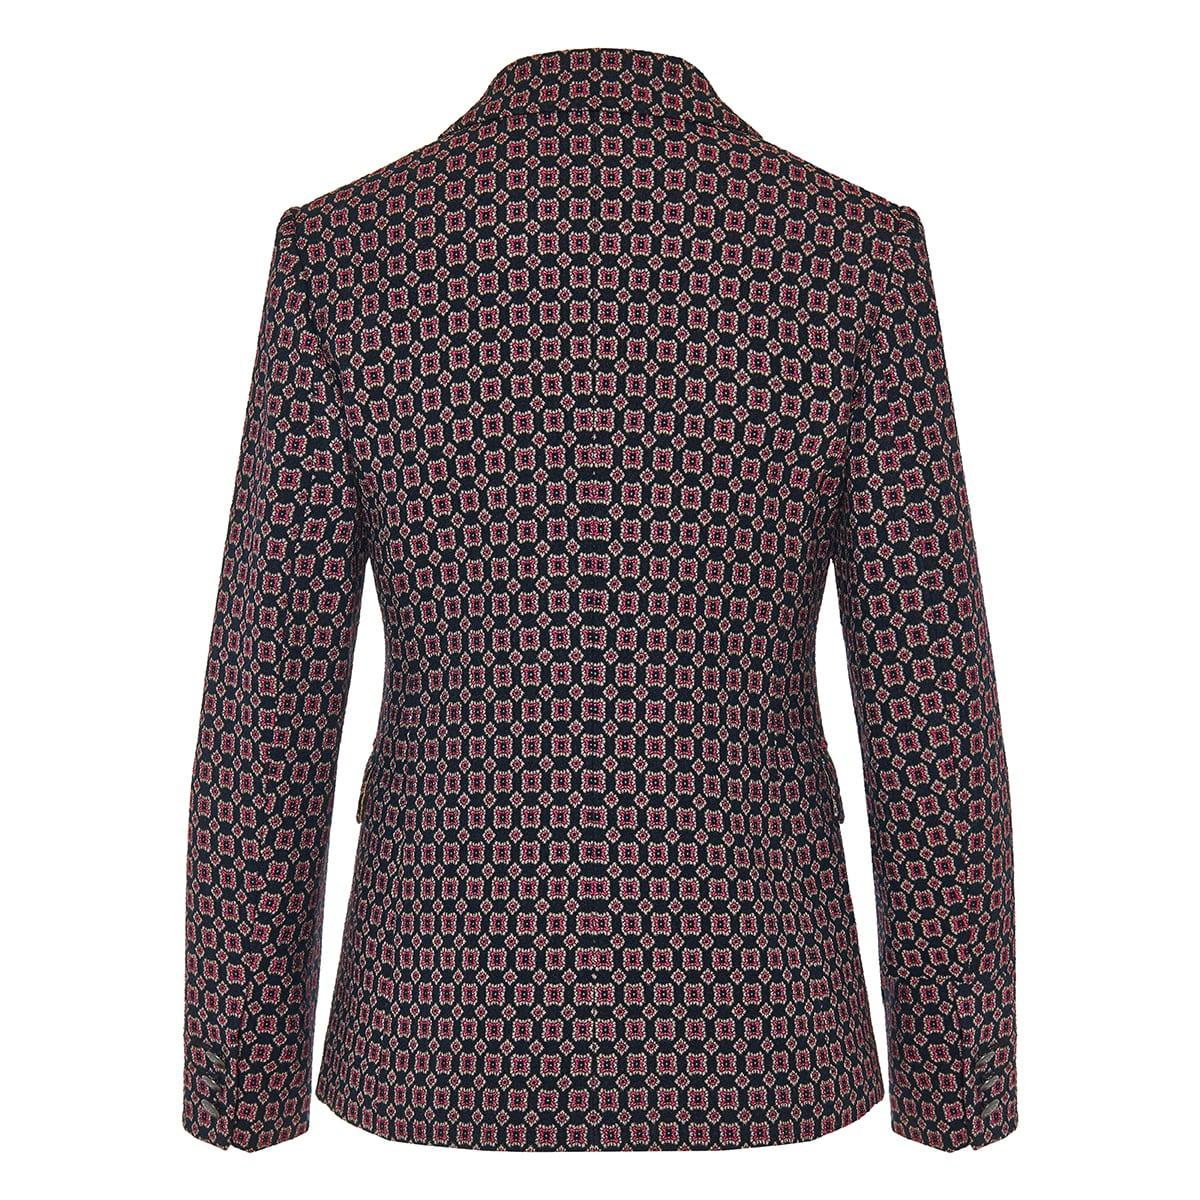 Geometric print jacquard blazer